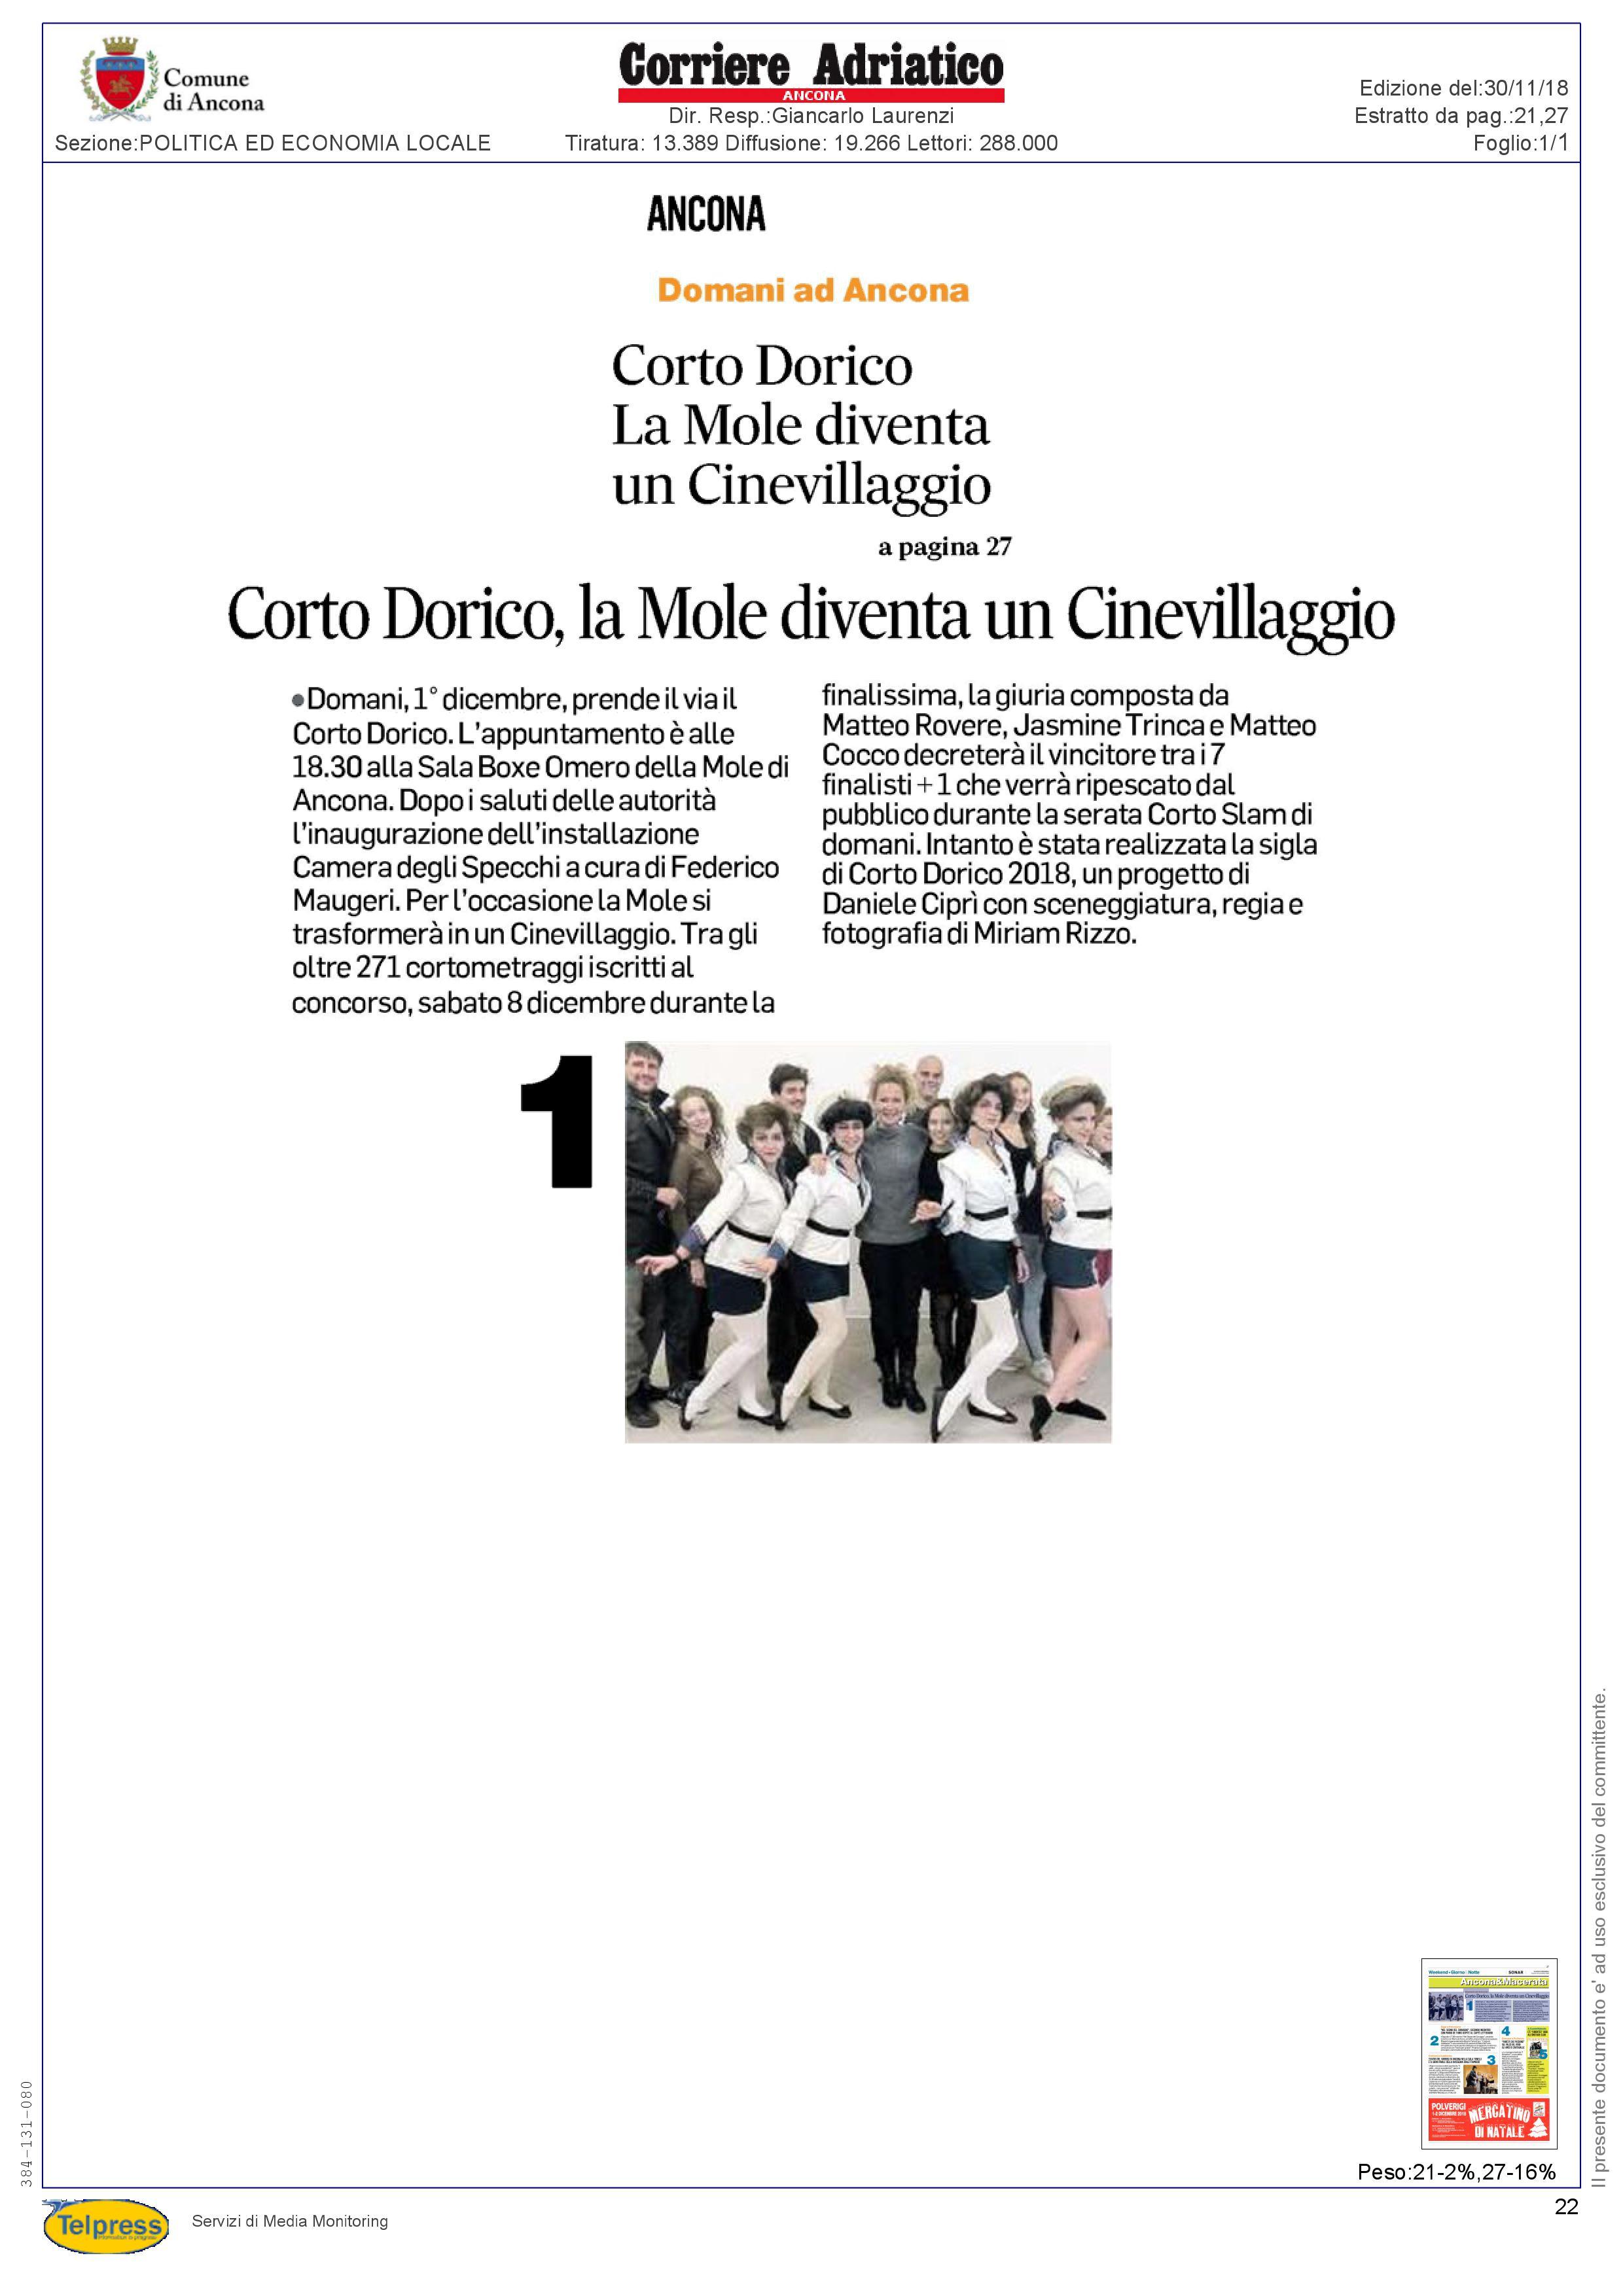 30-11-18 Corriere Adriatico